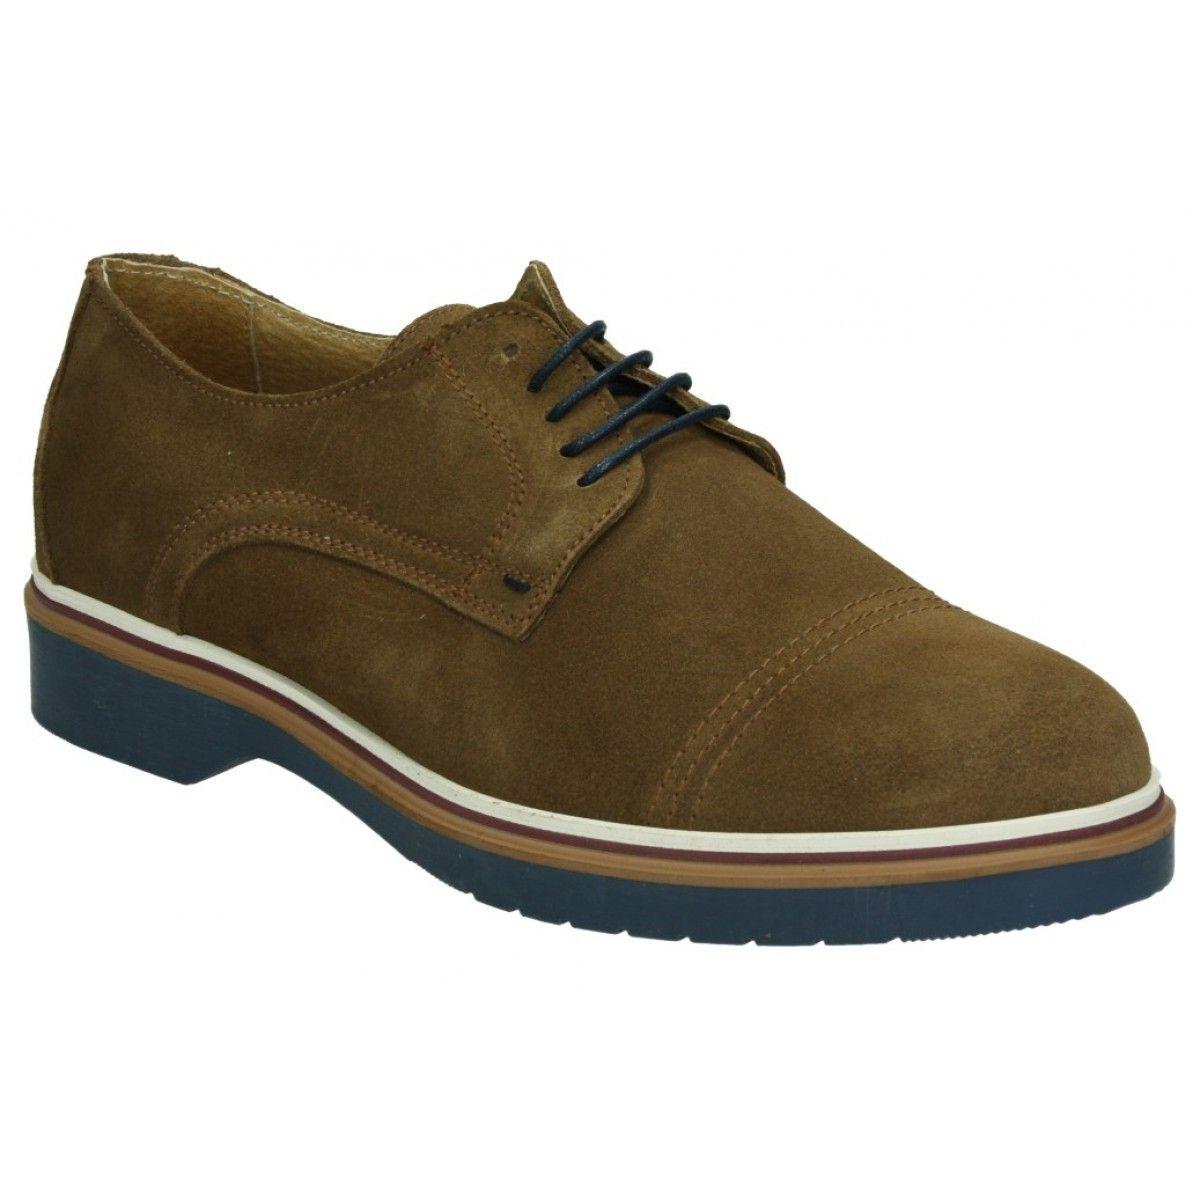 Zapatos Jovisa Hombre Megacalzado Hombre Hombre Zapatos 820 Jovisa Megacalzado Zapatos 820 pUVqSzM